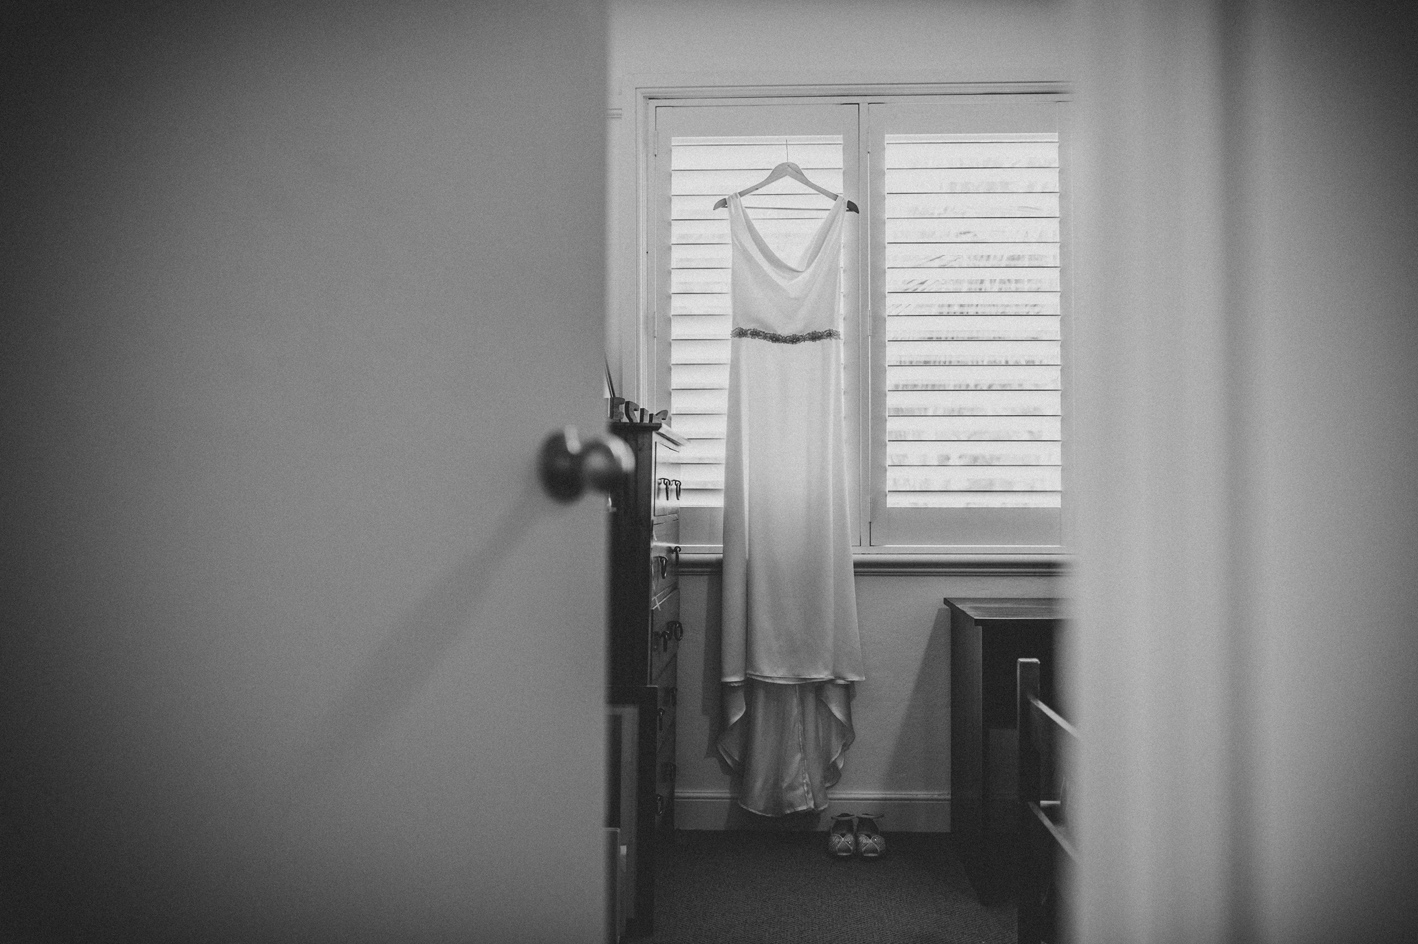 002-dave-lexi-mosman-sydney-sophie-baker-photography